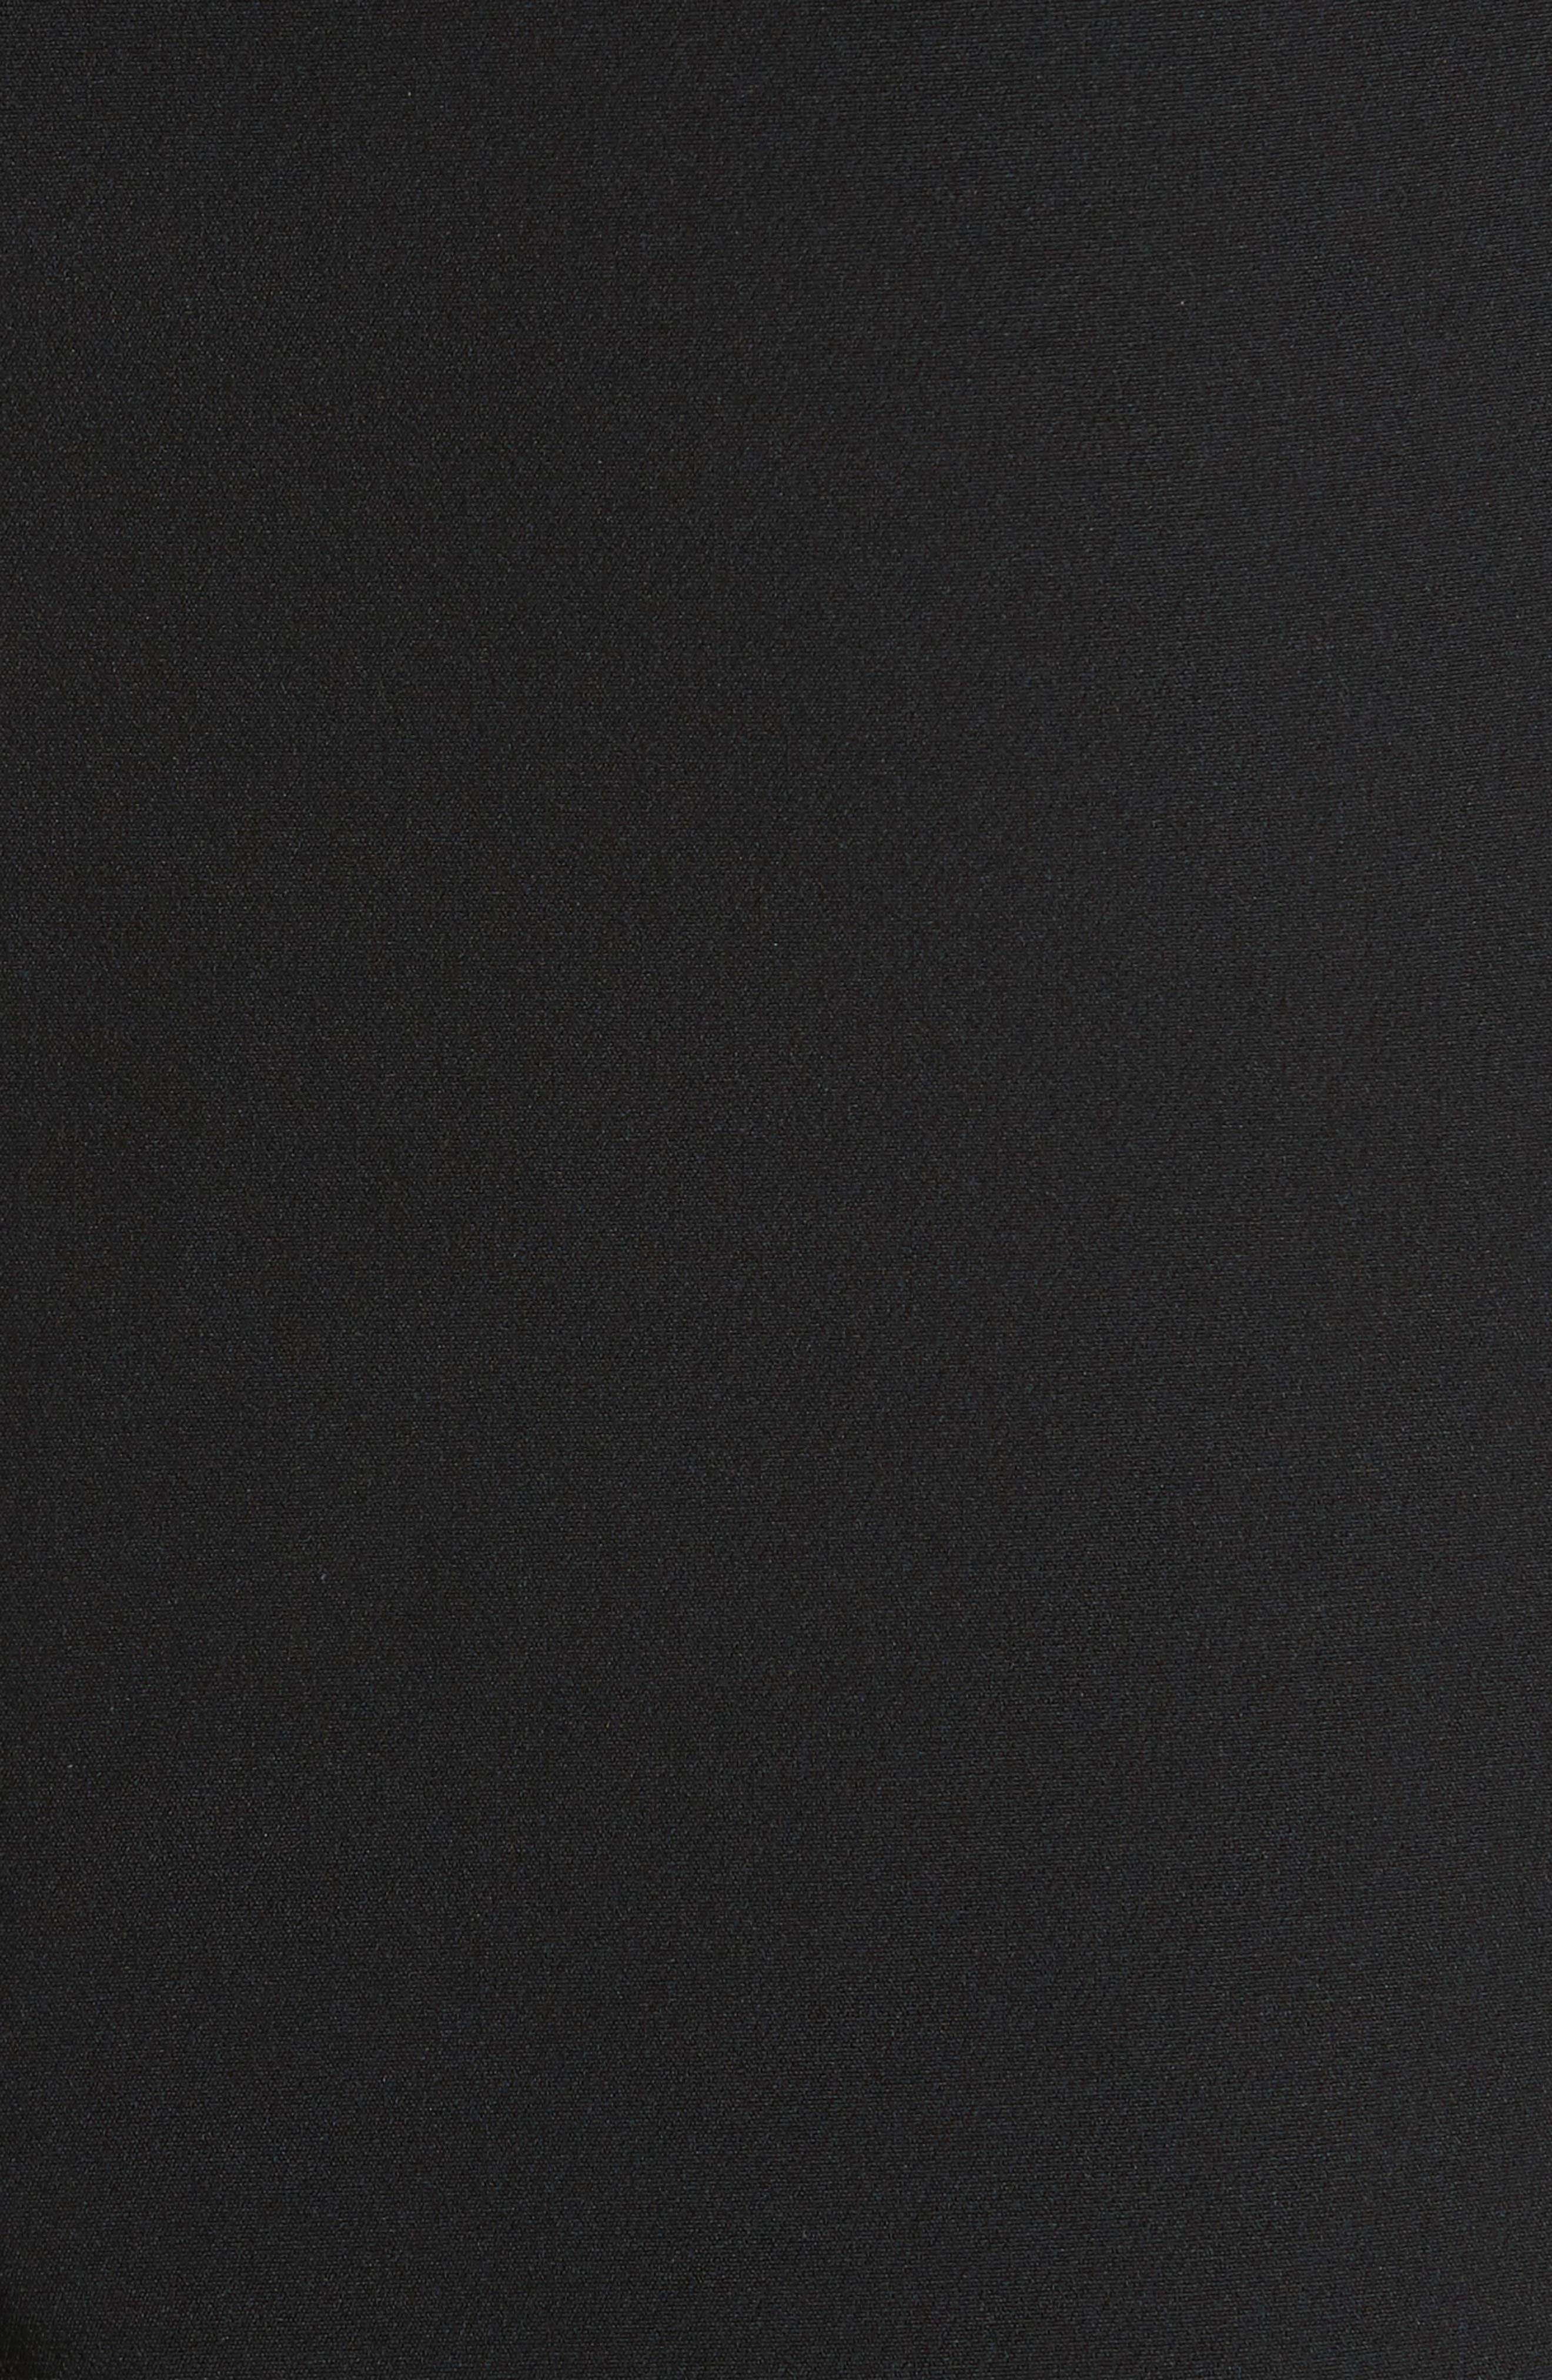 Luna Cutout Detail Crepe Sheath Dress,                             Alternate thumbnail 5, color,                             Black